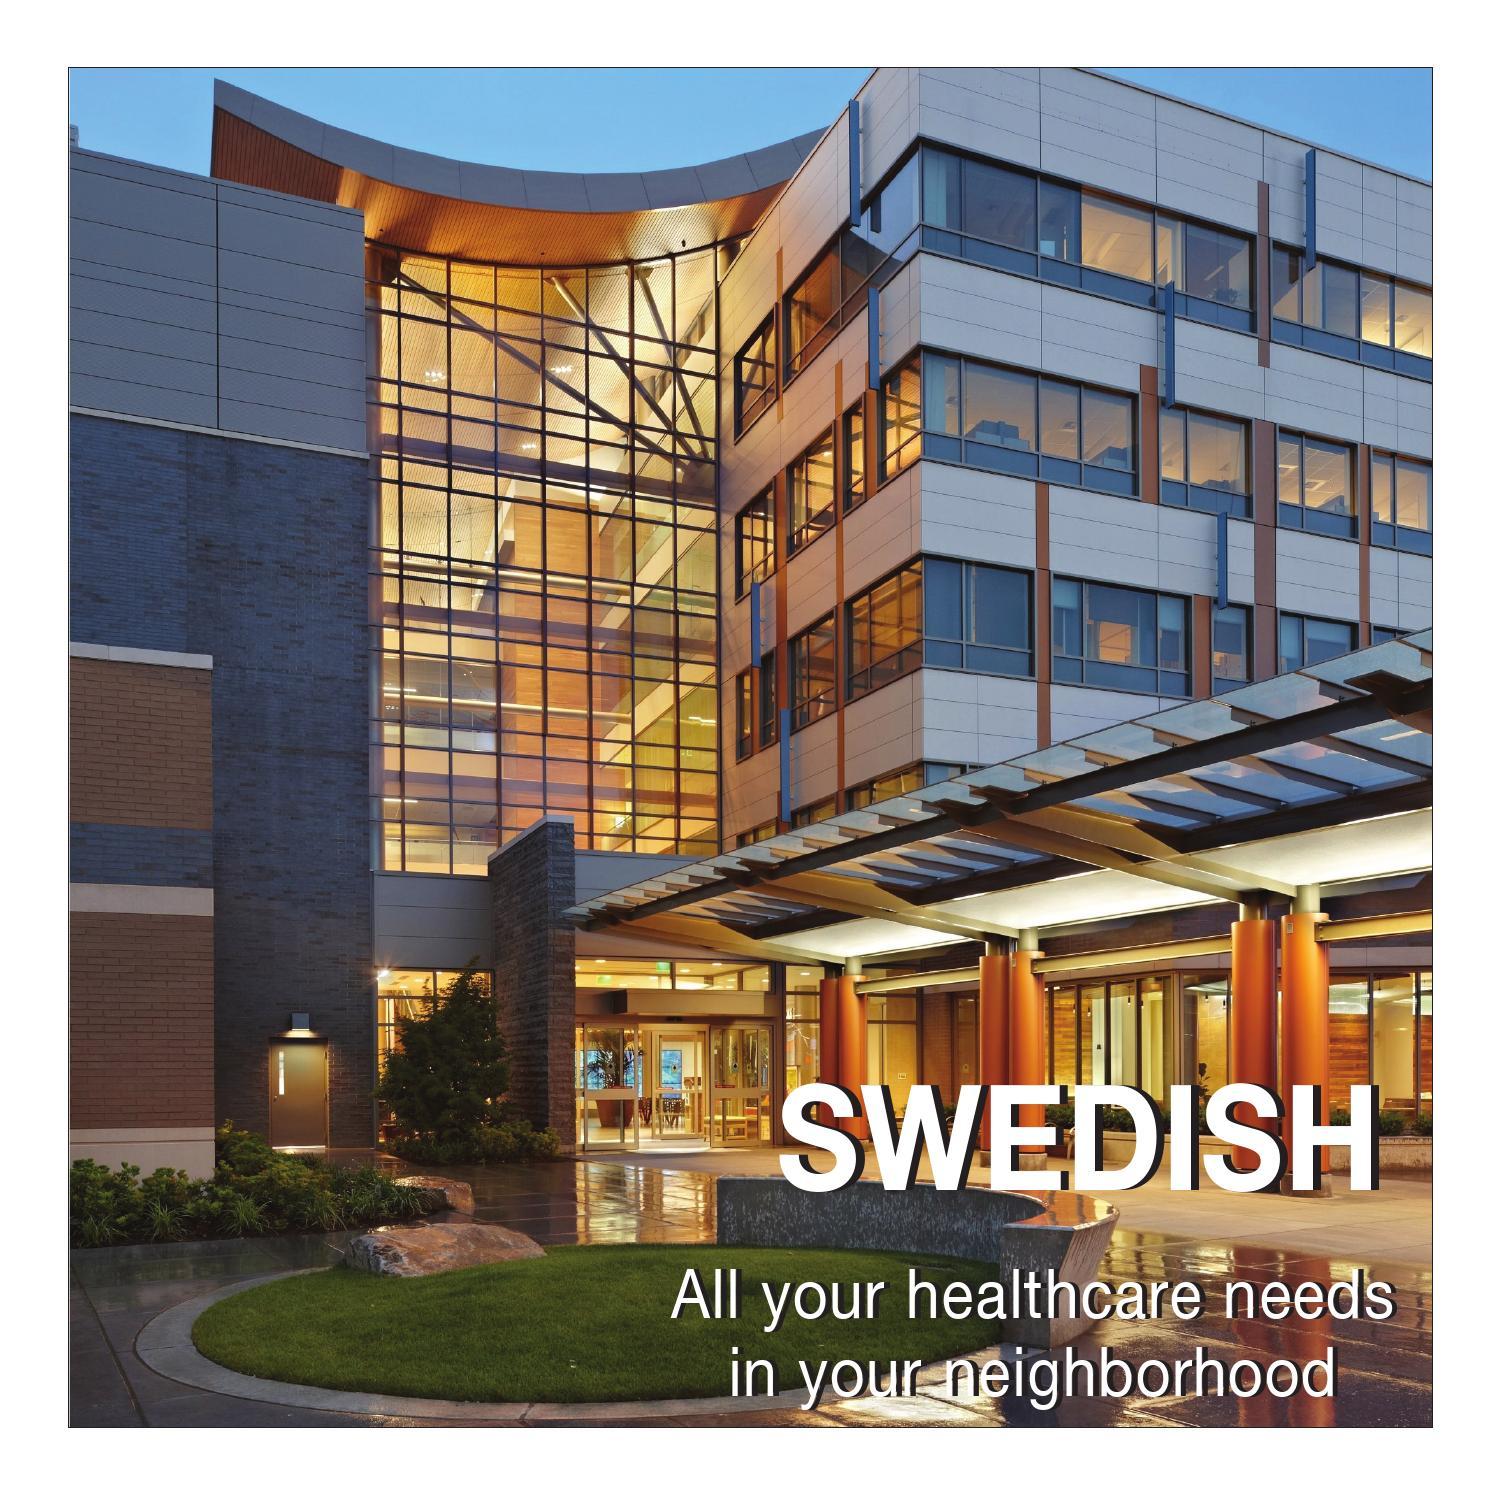 Swedish breast center cherry hill campus